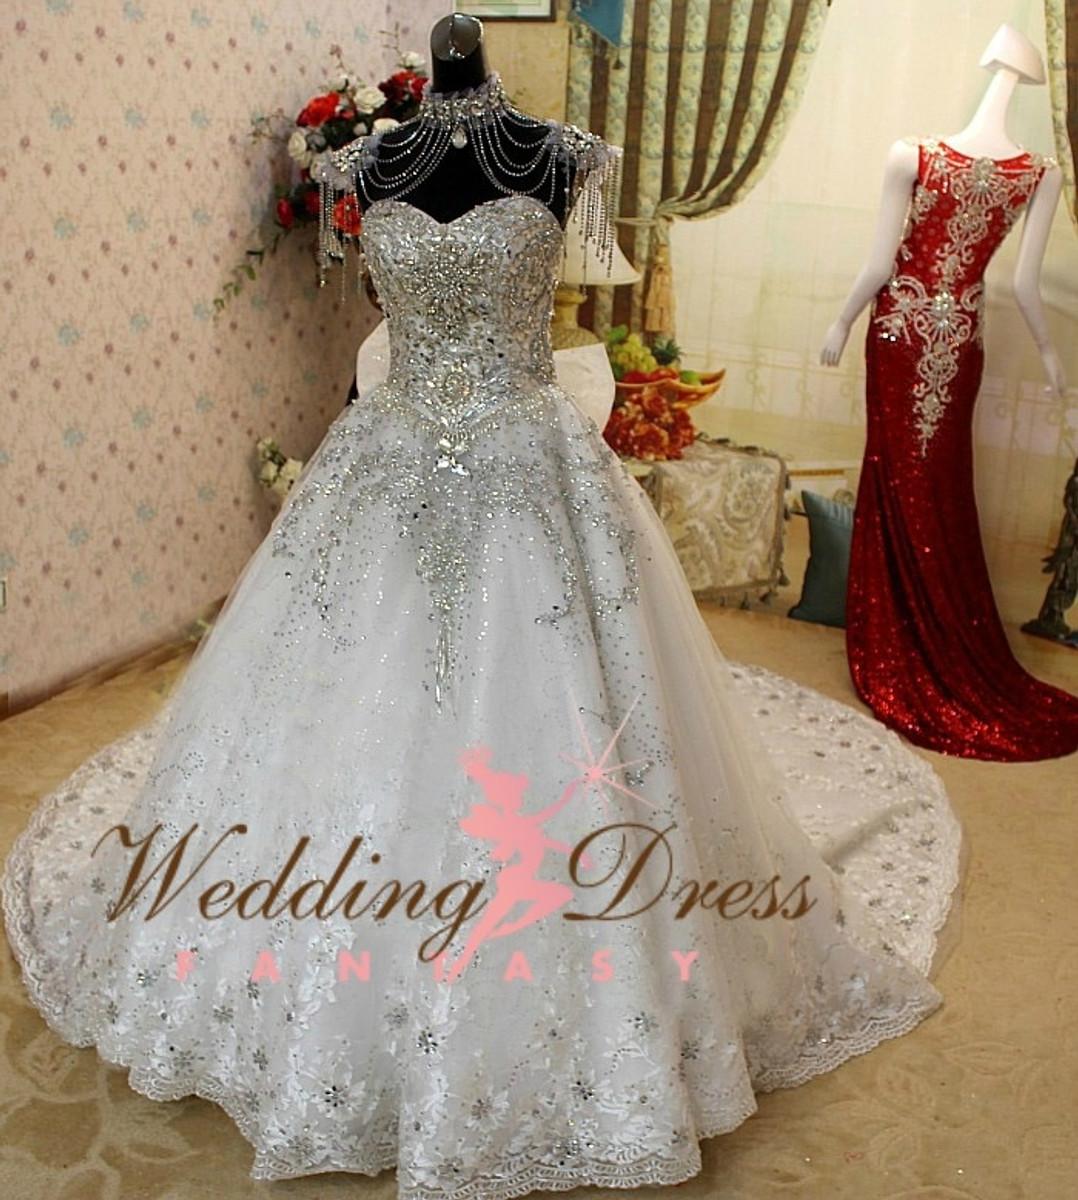 Gypsy Wedding Dress and Irish Traveller Wedding Dress